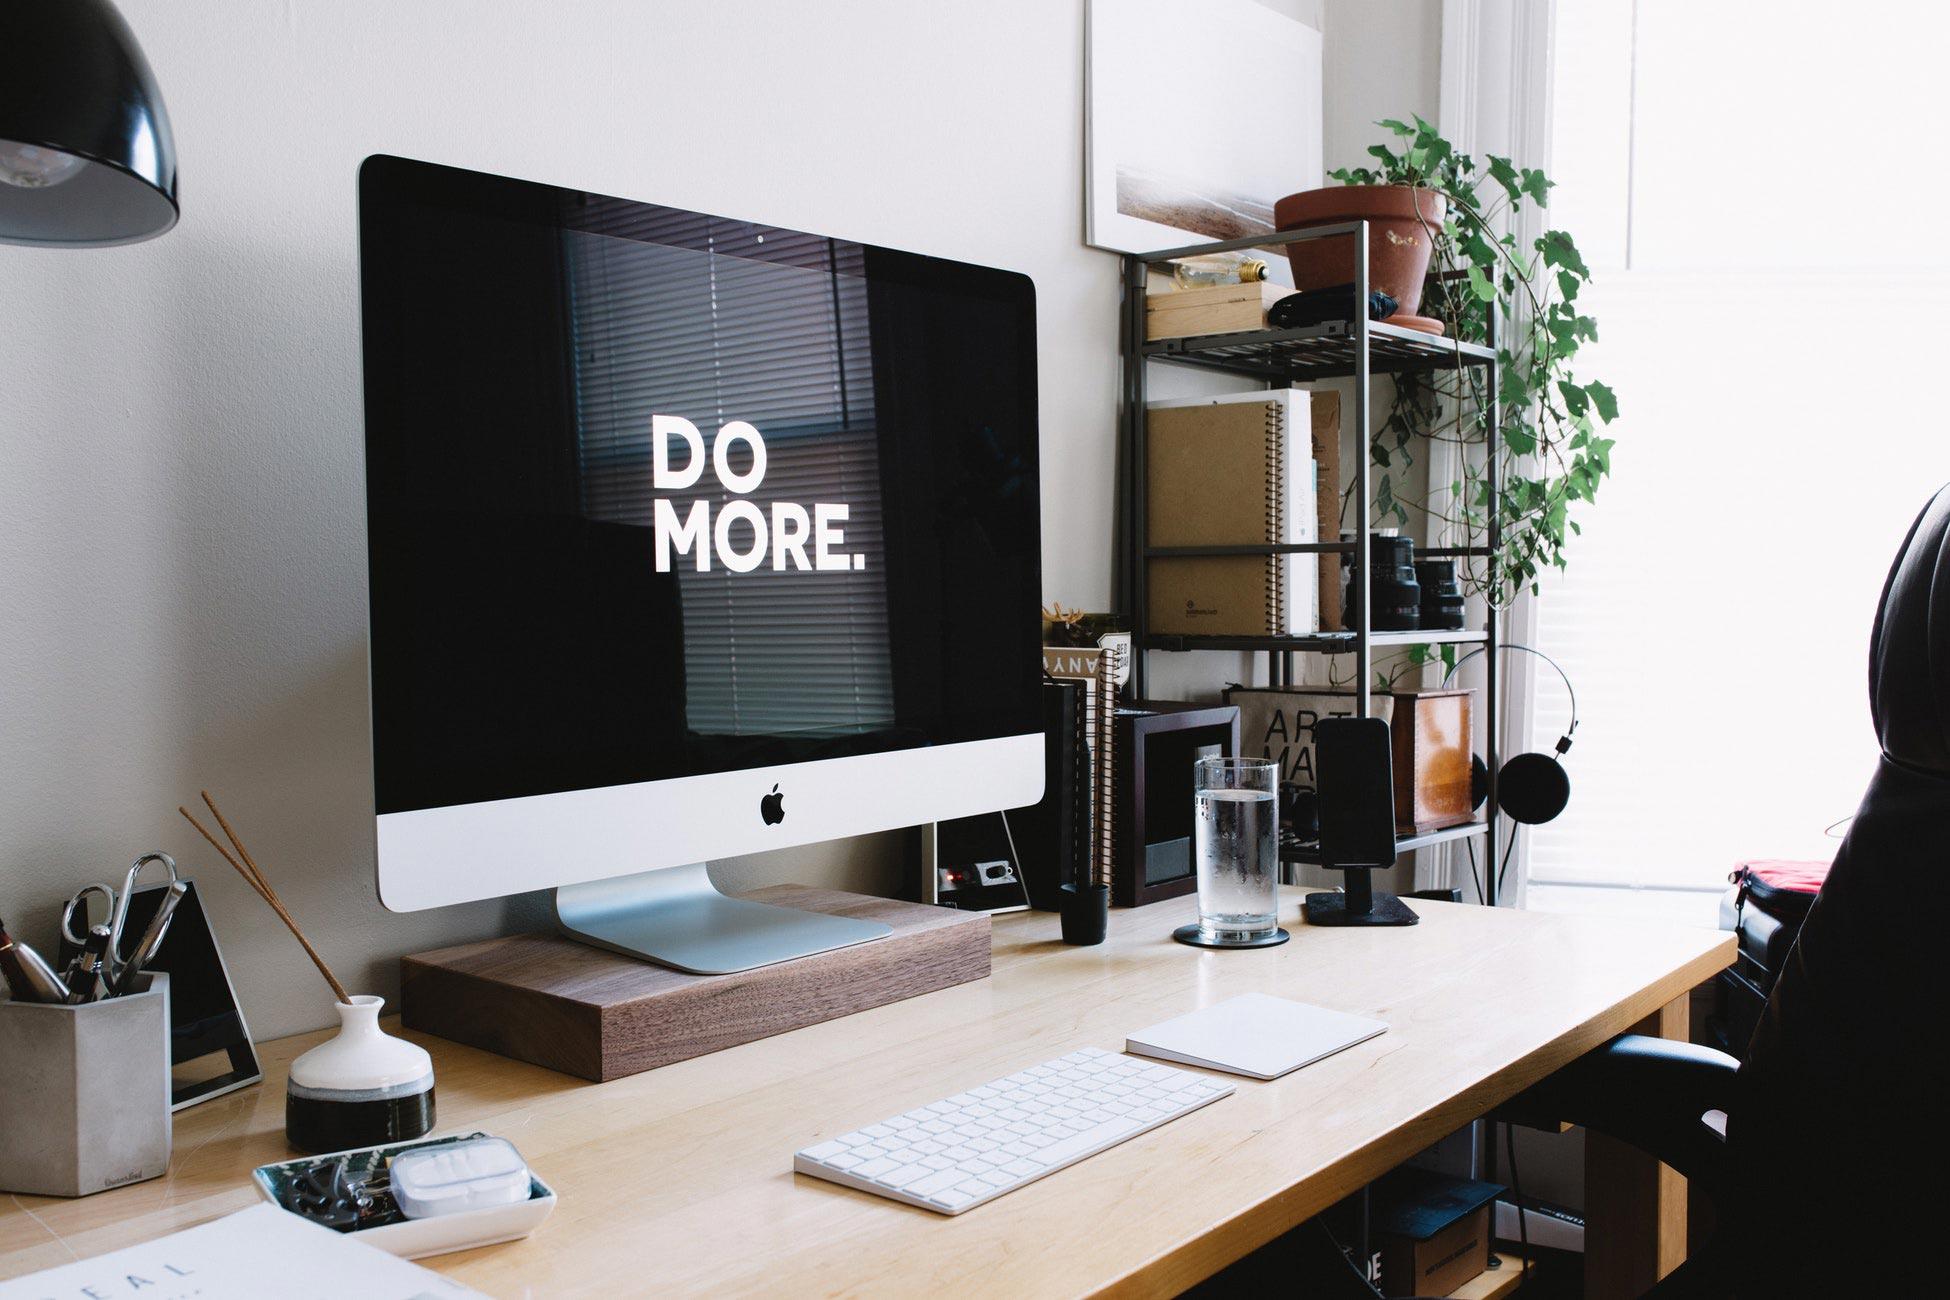 ydesigners do more business